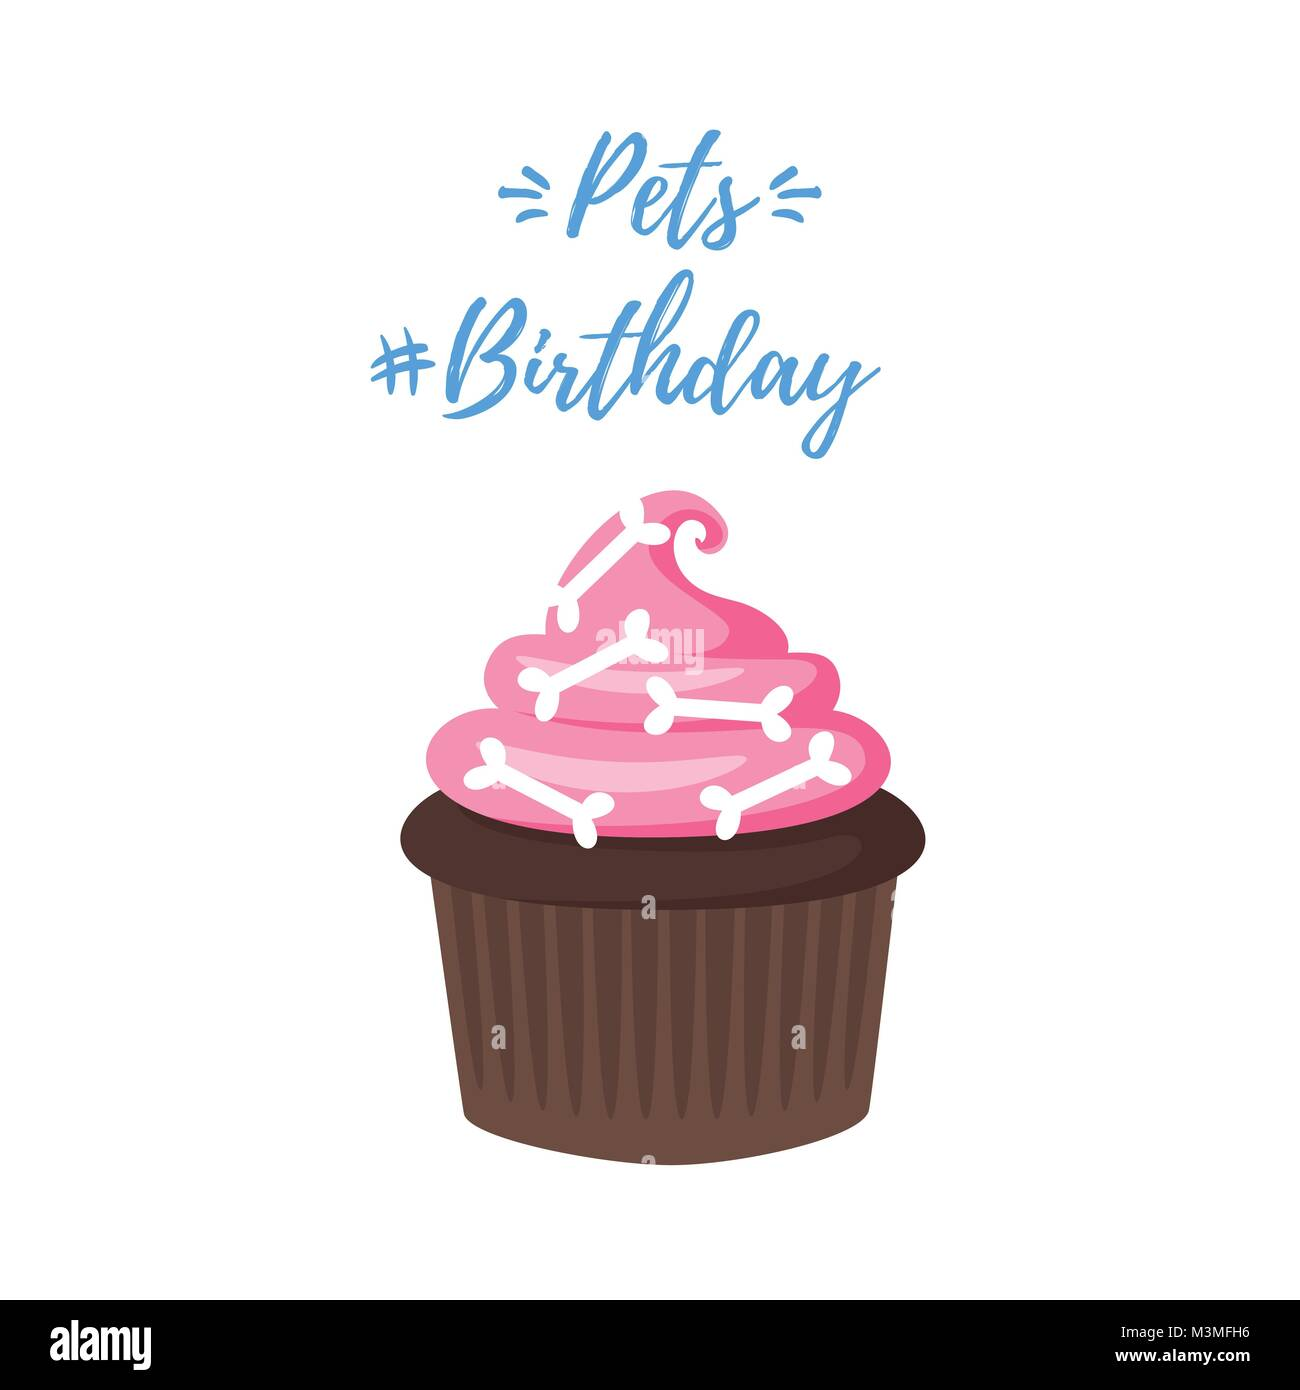 Vector Cartoon Style Illustration Of Dog Birthday Party Greeting